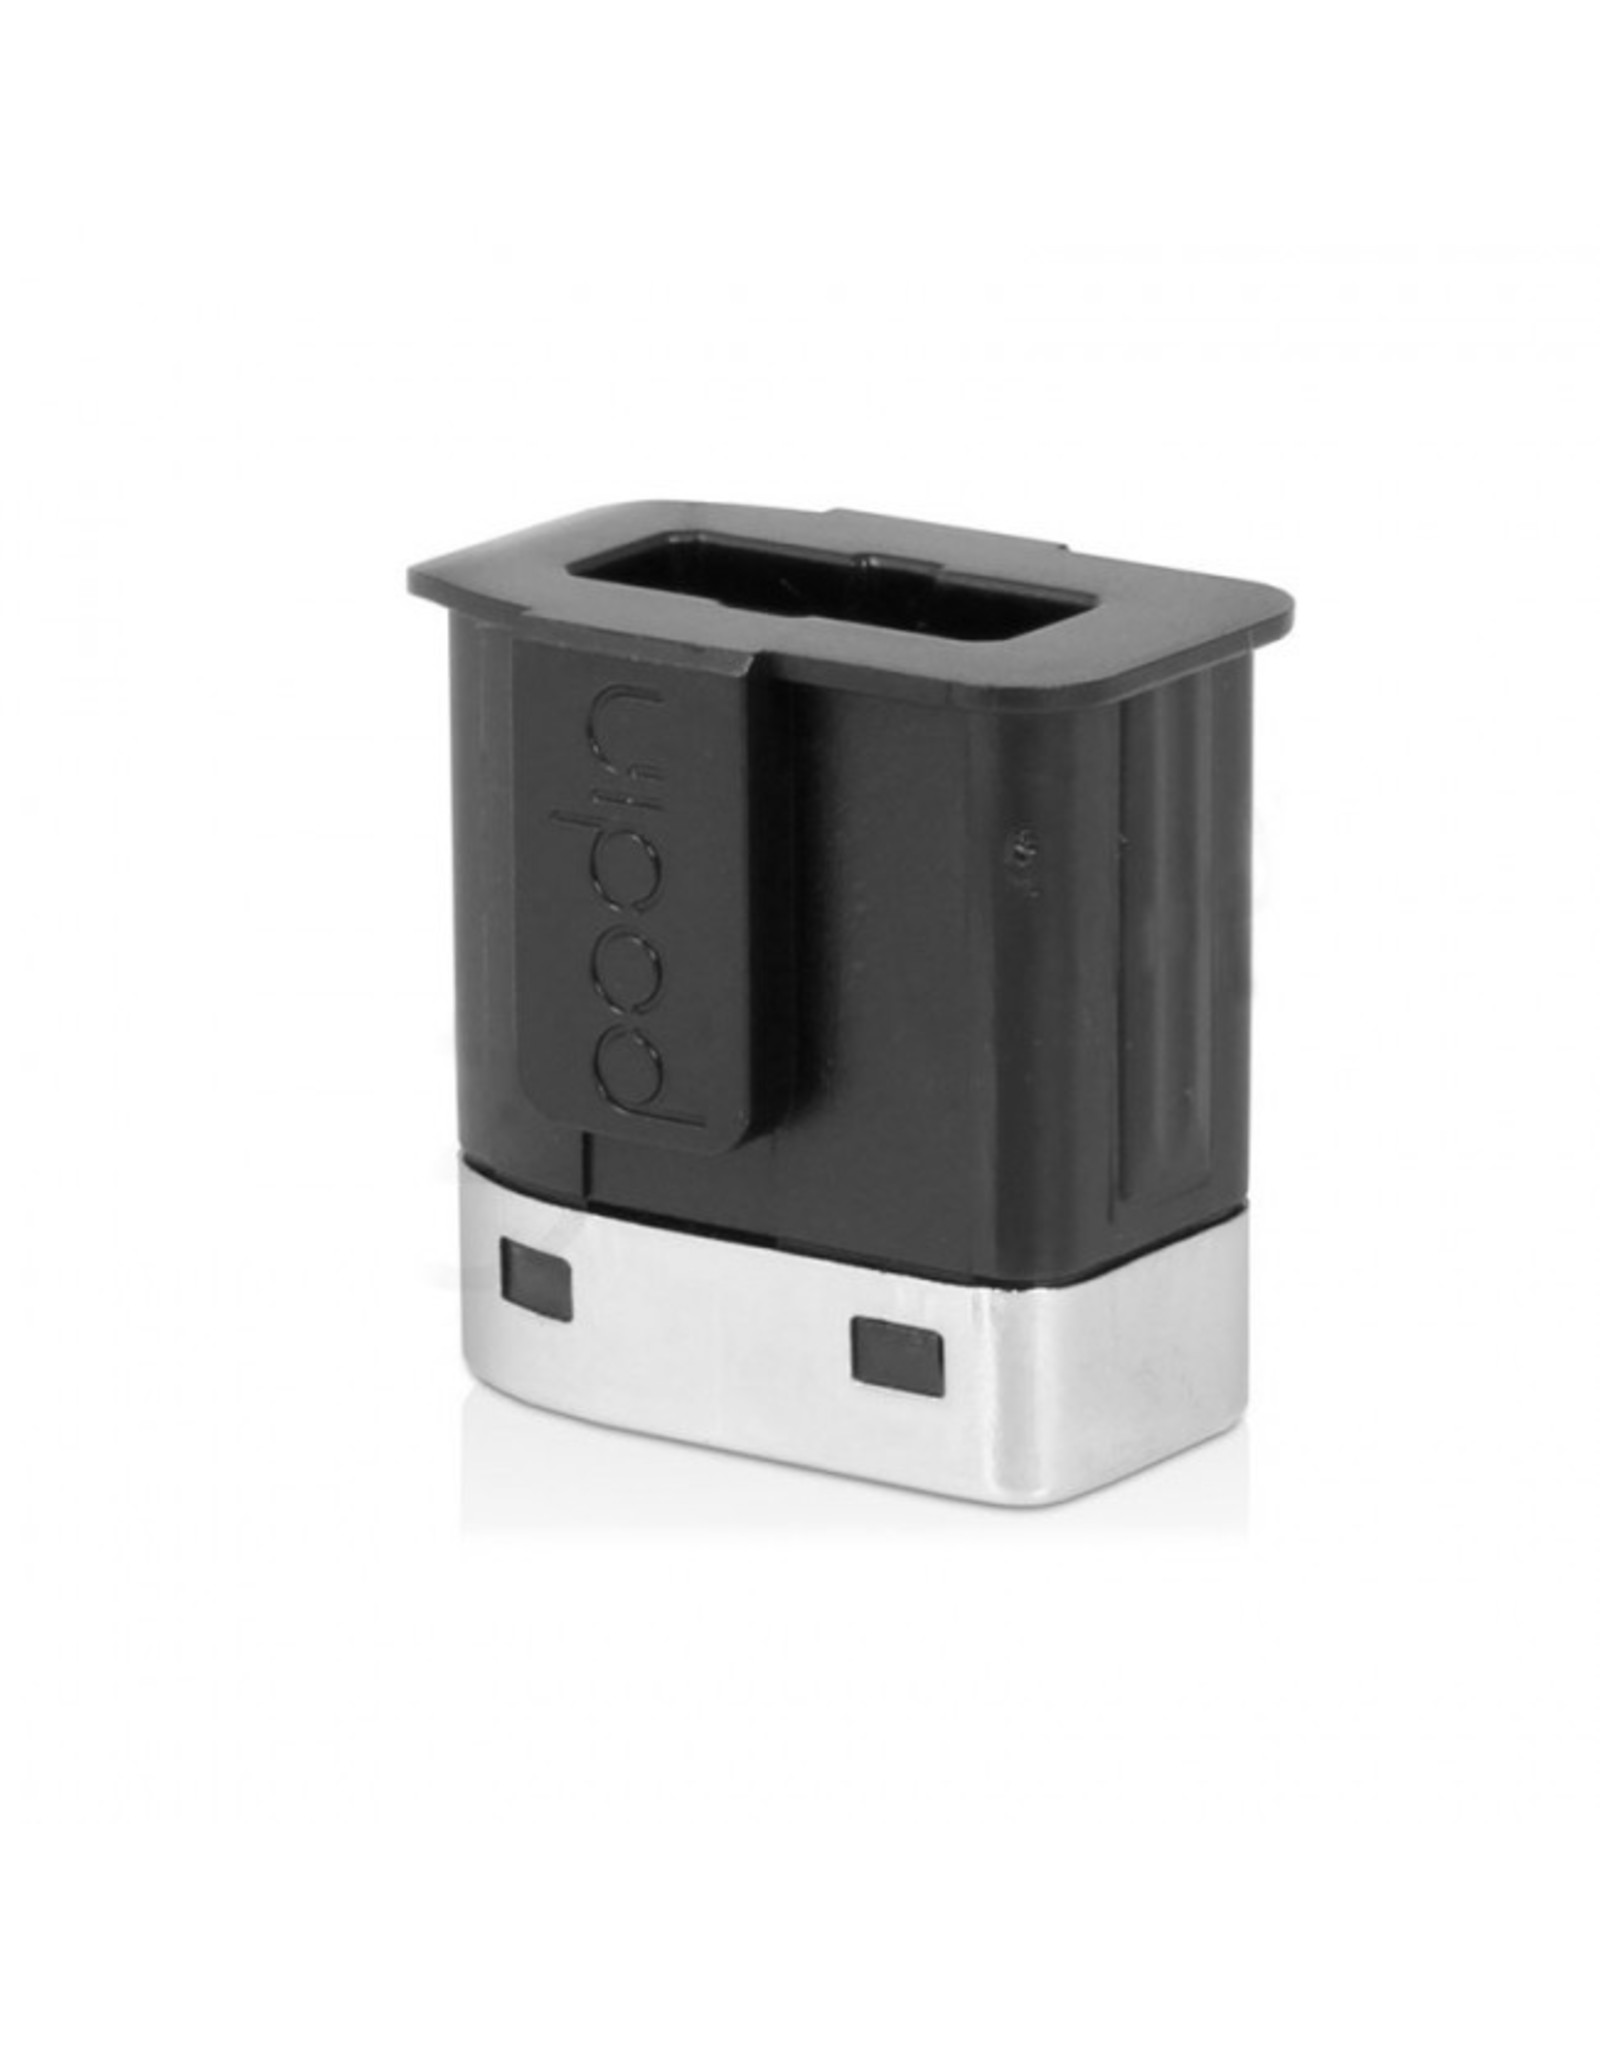 Innokin Innokin Podin Adapter for Juul 1/pk